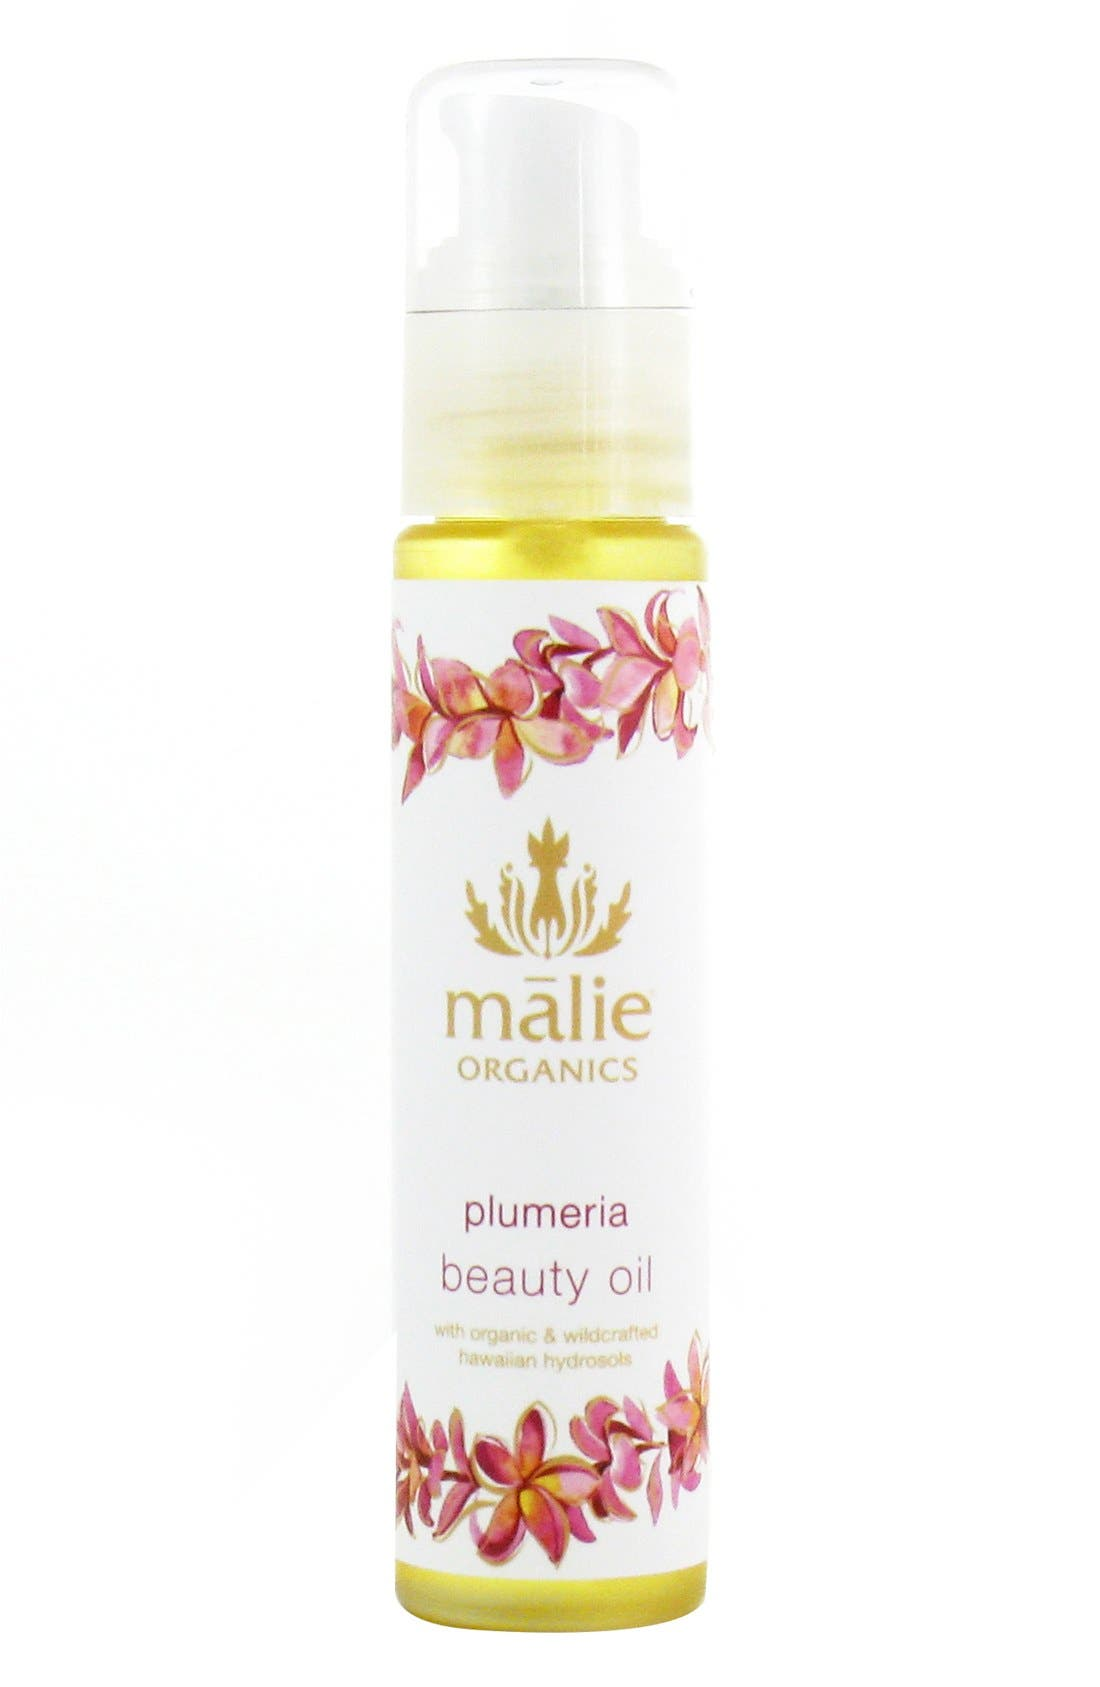 Malie Organics Plumeria Beauty Oil